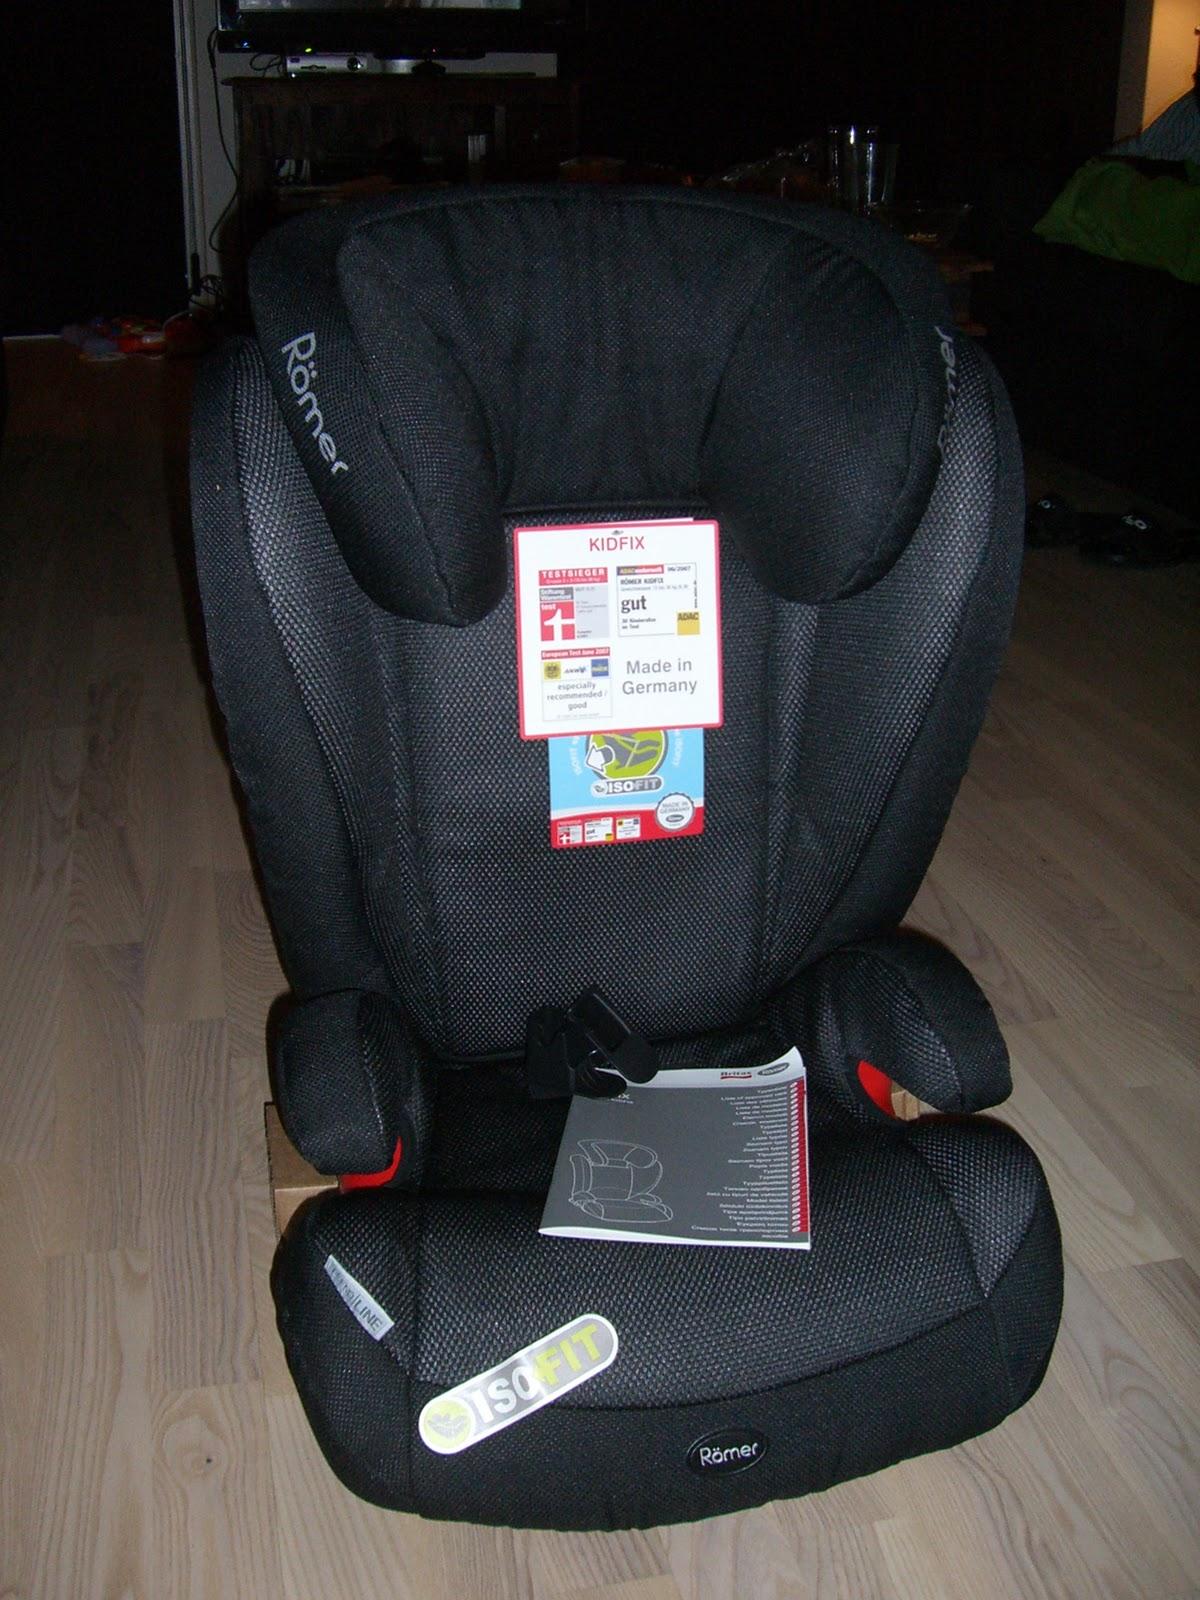 Børn og Samliv: Billig Römer autostol - Få nemt billige autostole